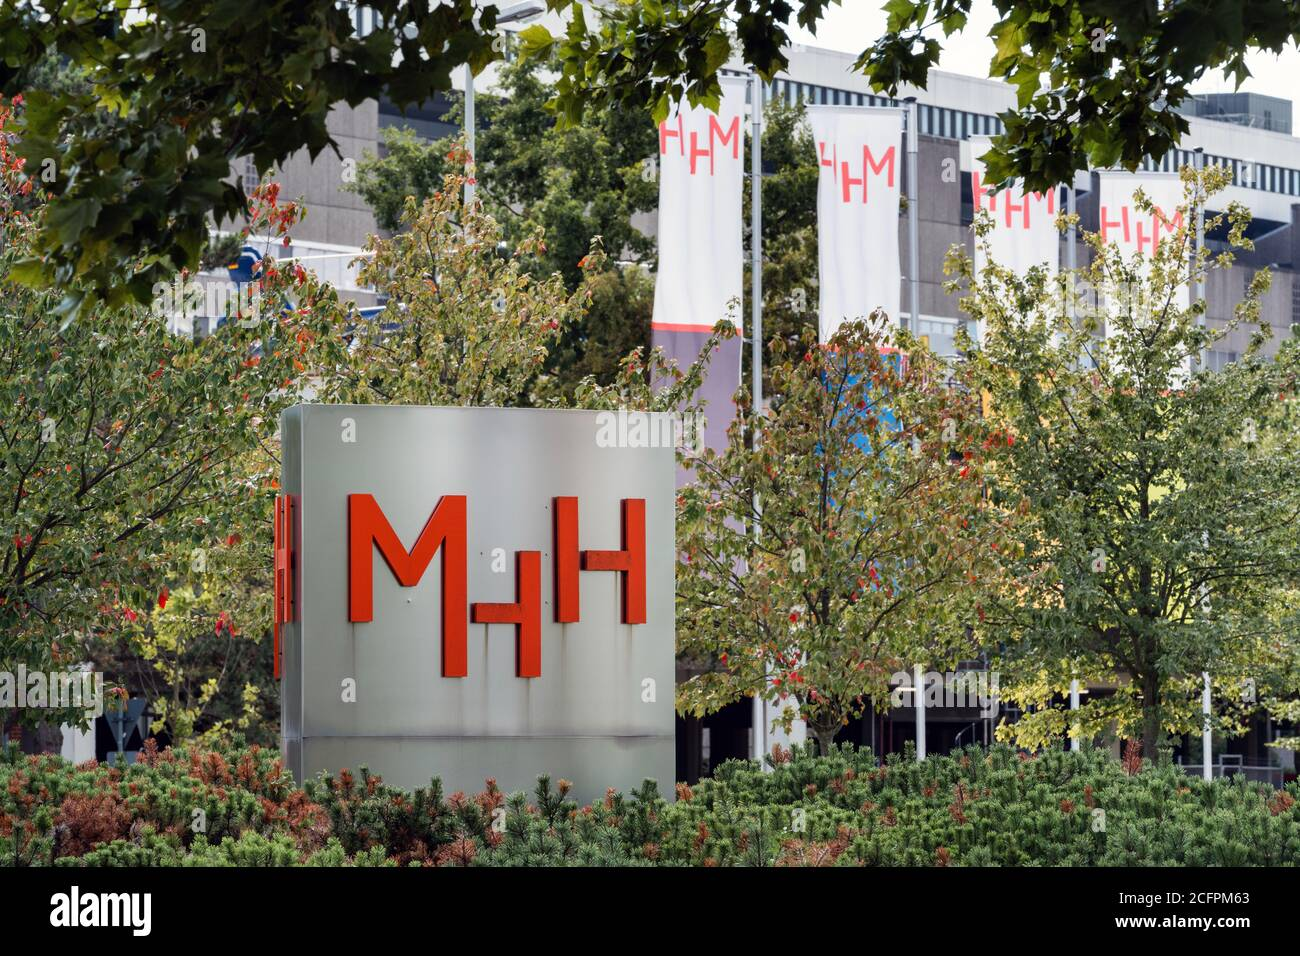 Hanover, Germany, September 6th, 2020: MHH Medical University Hanover, flags with the MHH logo on the central entrance.   ---   Hannover, 06.09.2020: MHH Medizinische Hochschule Hannover, Fahnen mit dem Logo der MHH an der zentralen Zufahrt. Stock Photo